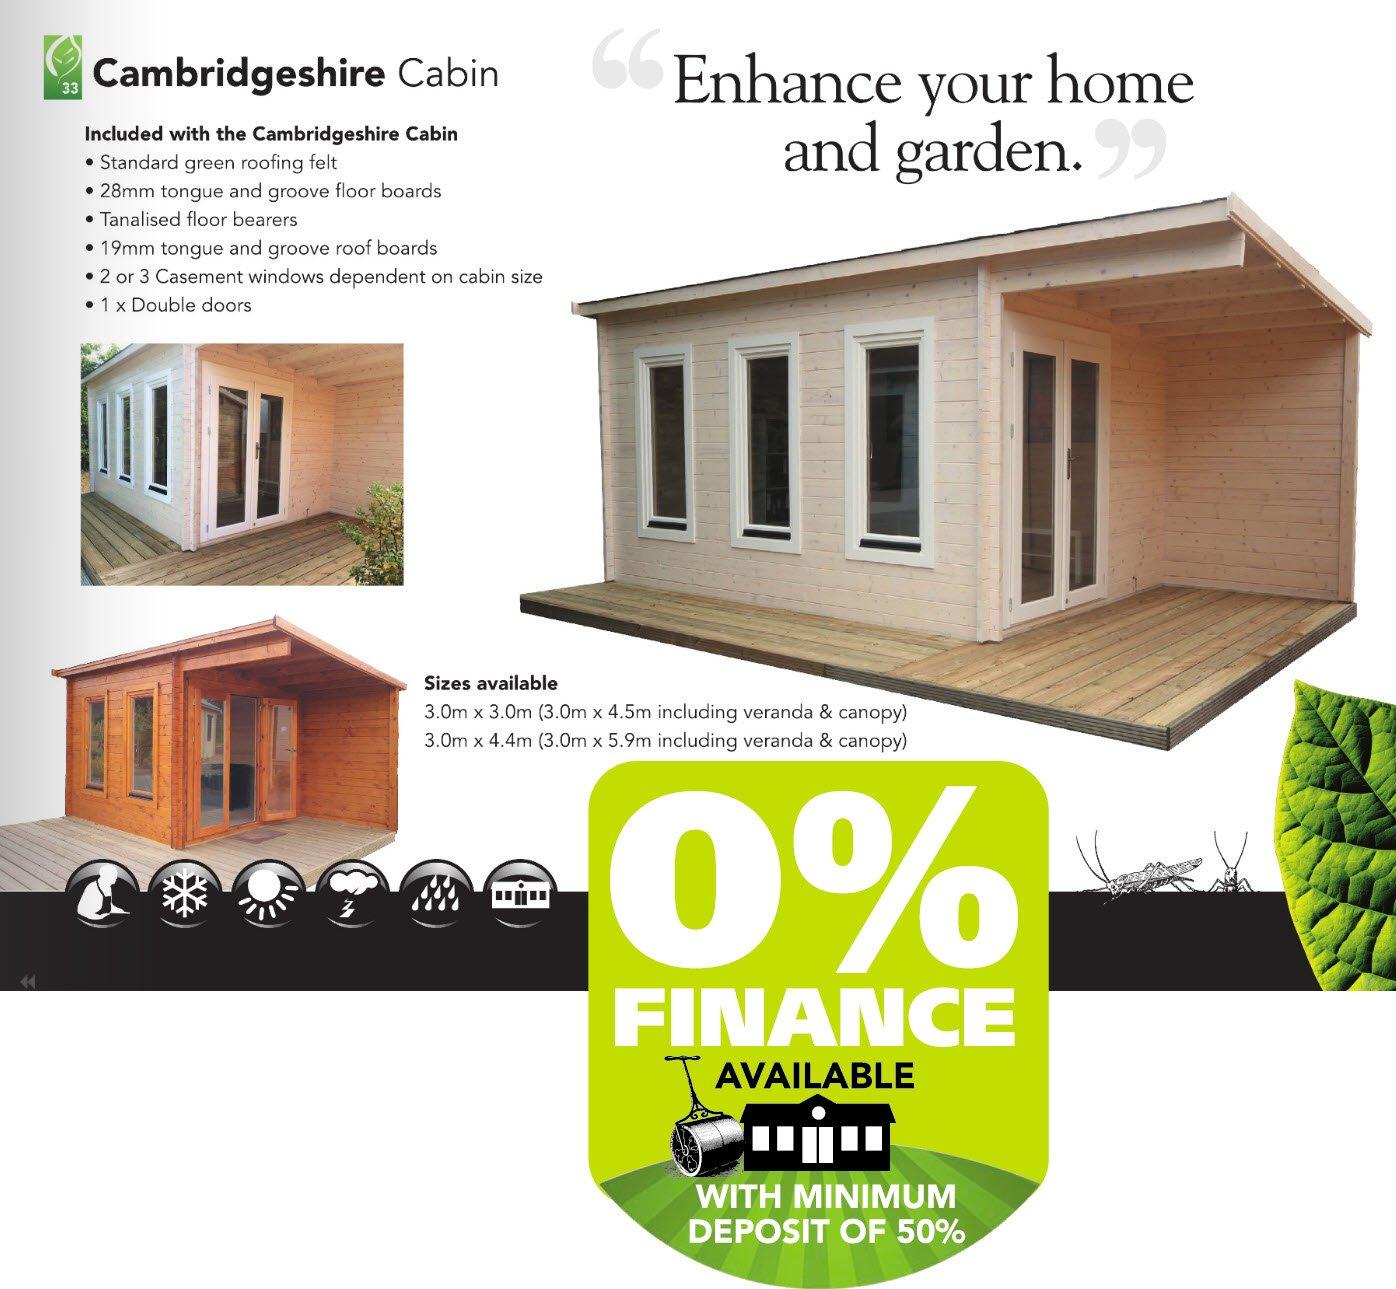 'Cambridgeshire'